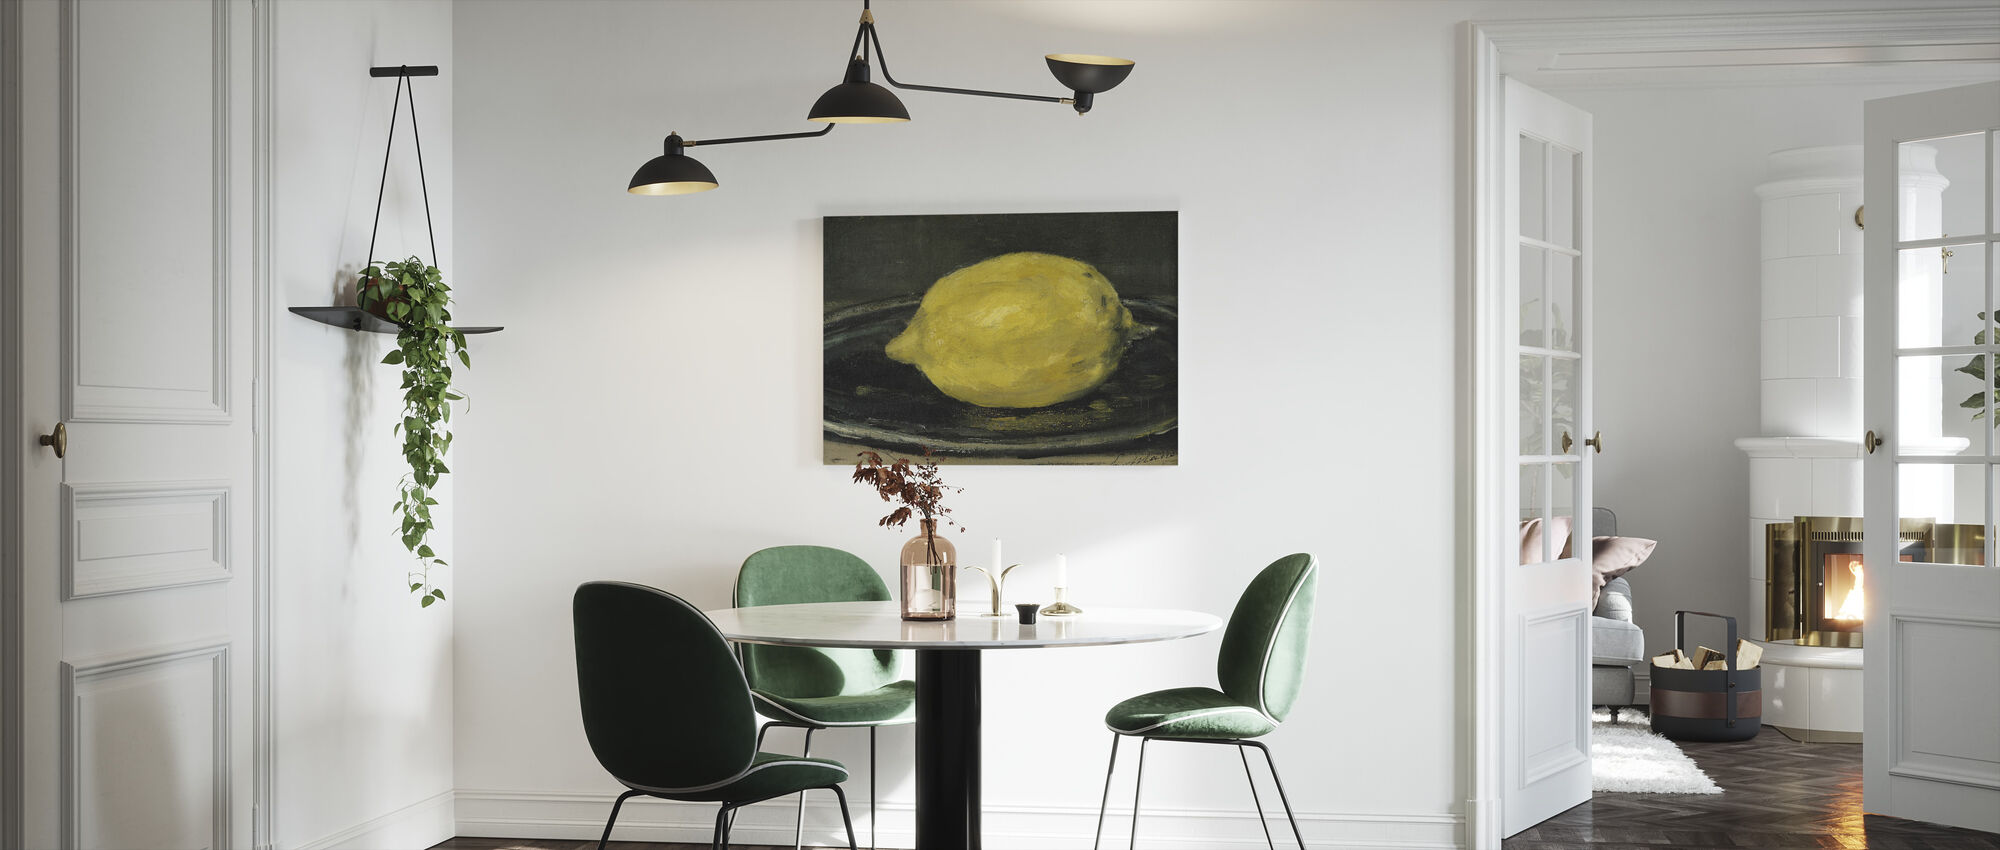 Lemon, Edouard Manet - Canvas print - Kitchen